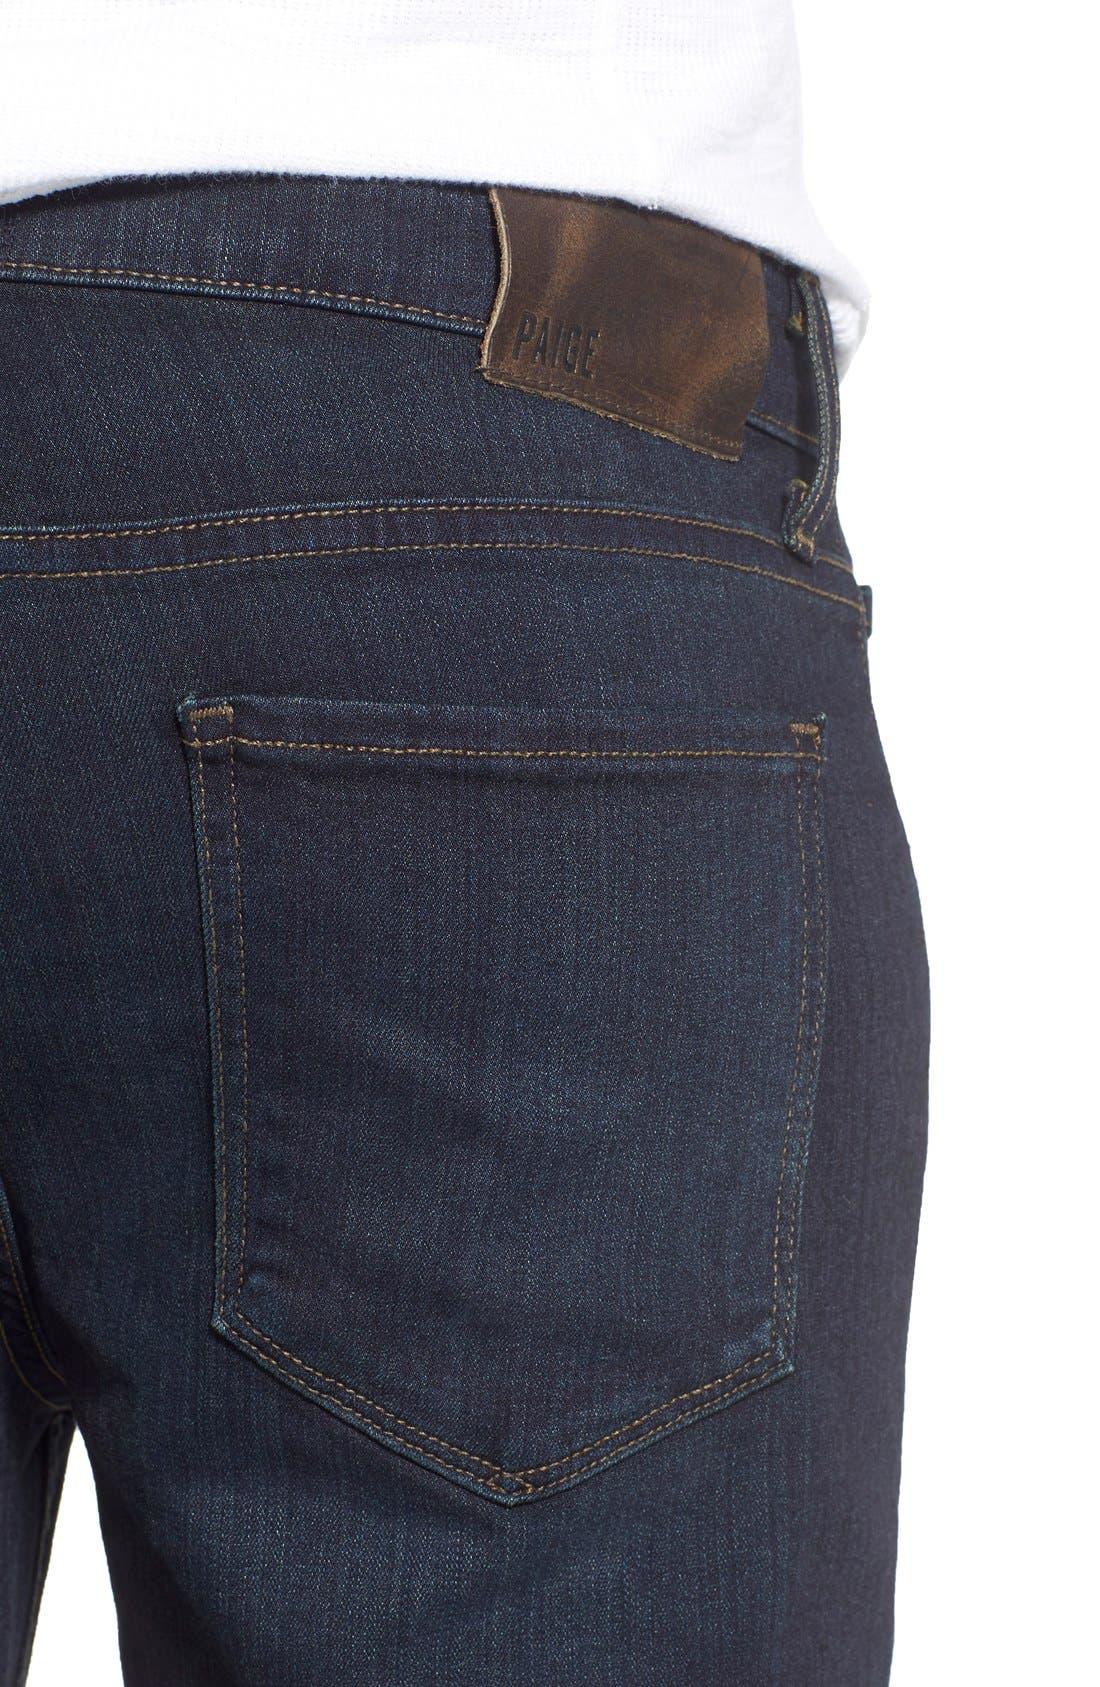 Lennox Slim Fit Jeans,                             Alternate thumbnail 4, color,                             Cellar